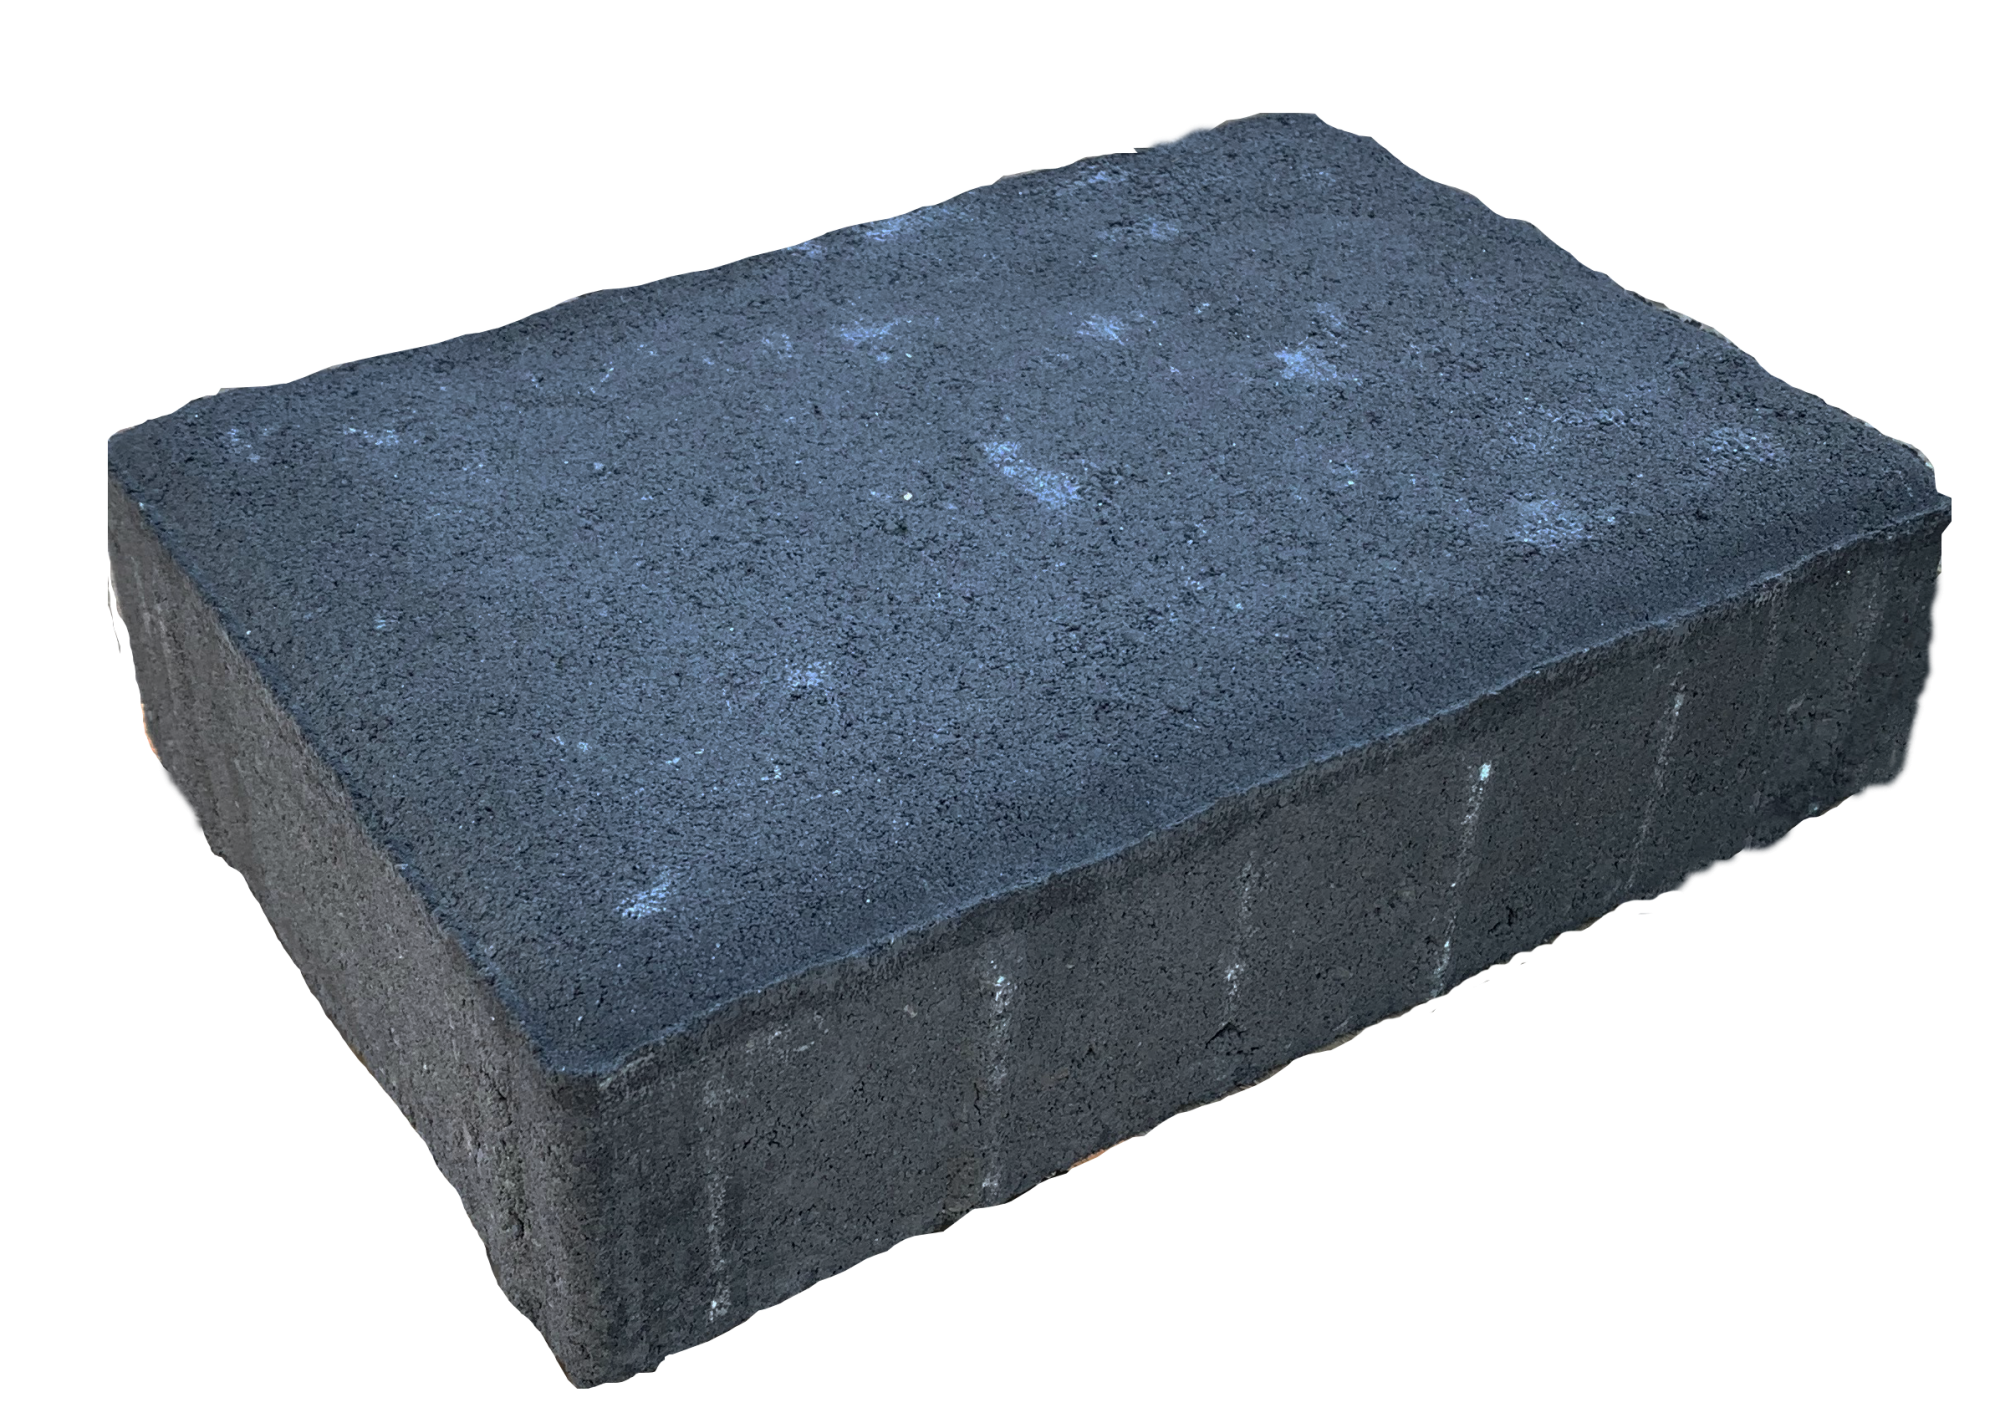 Paver Cambridge 6x9 Coal